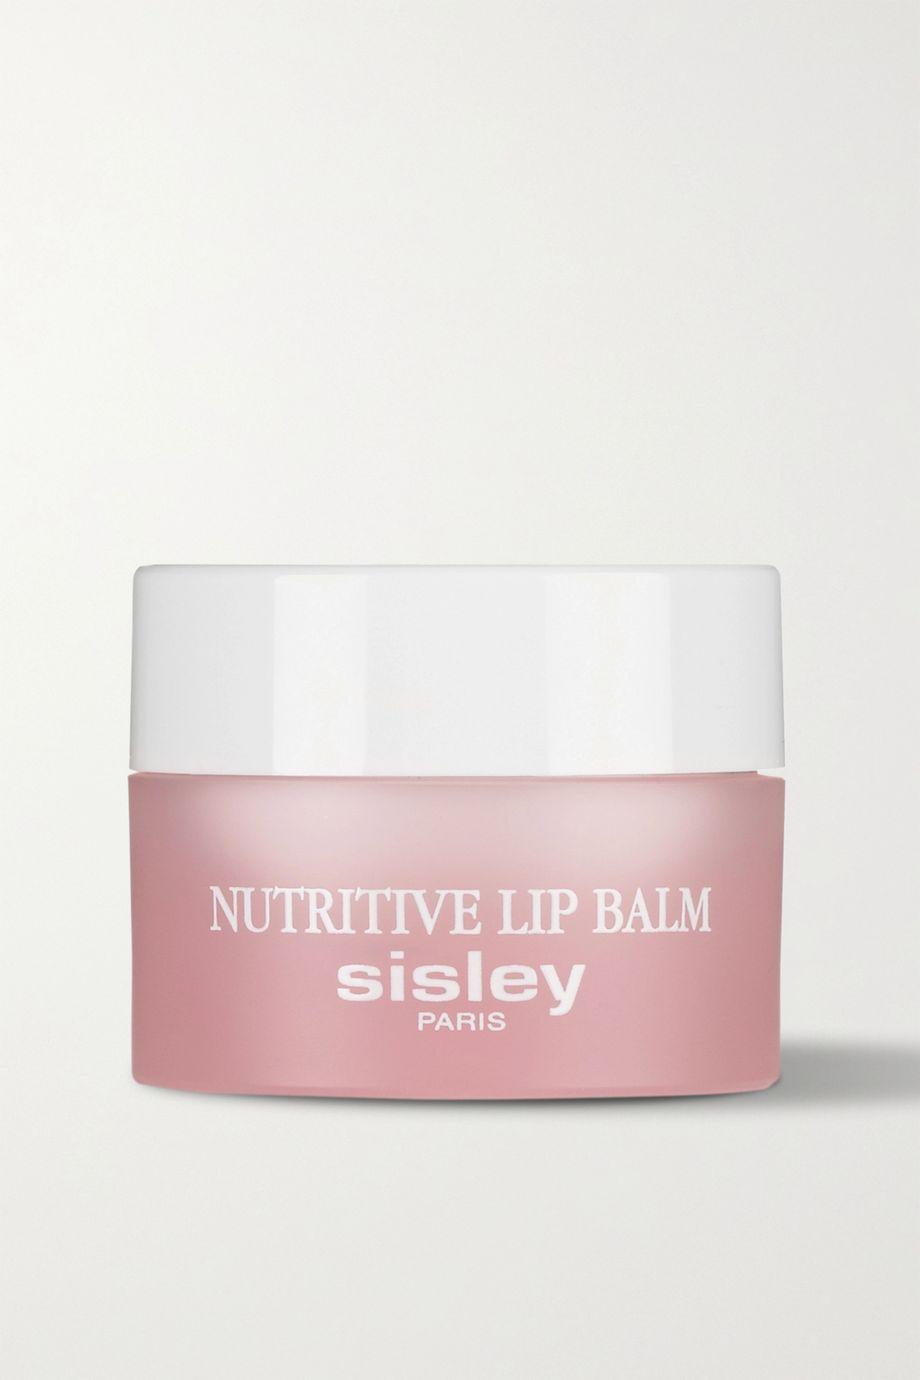 Sisley Comfort Extreme Nutritive Lip Balm, 9g